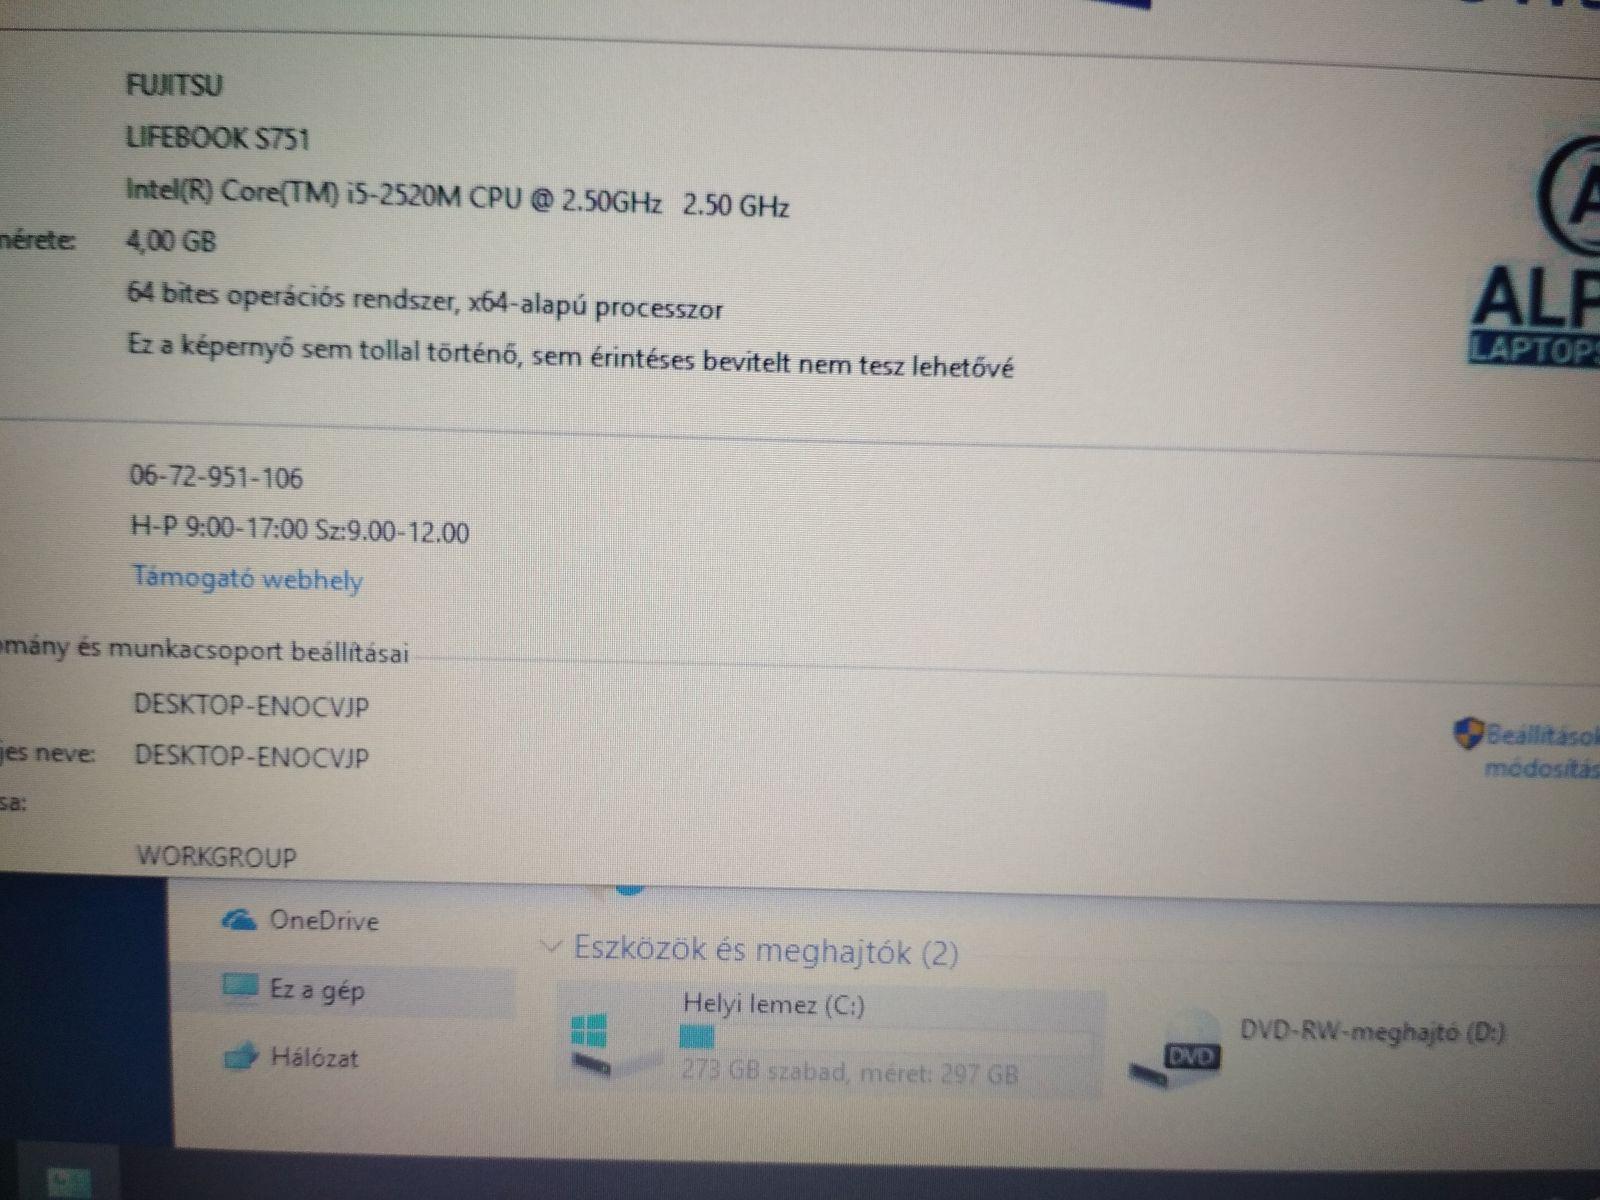 Fujitsu Lifebook S751 - i5 2520M / 4GB / 320GB HDD használt 3 hó gar!